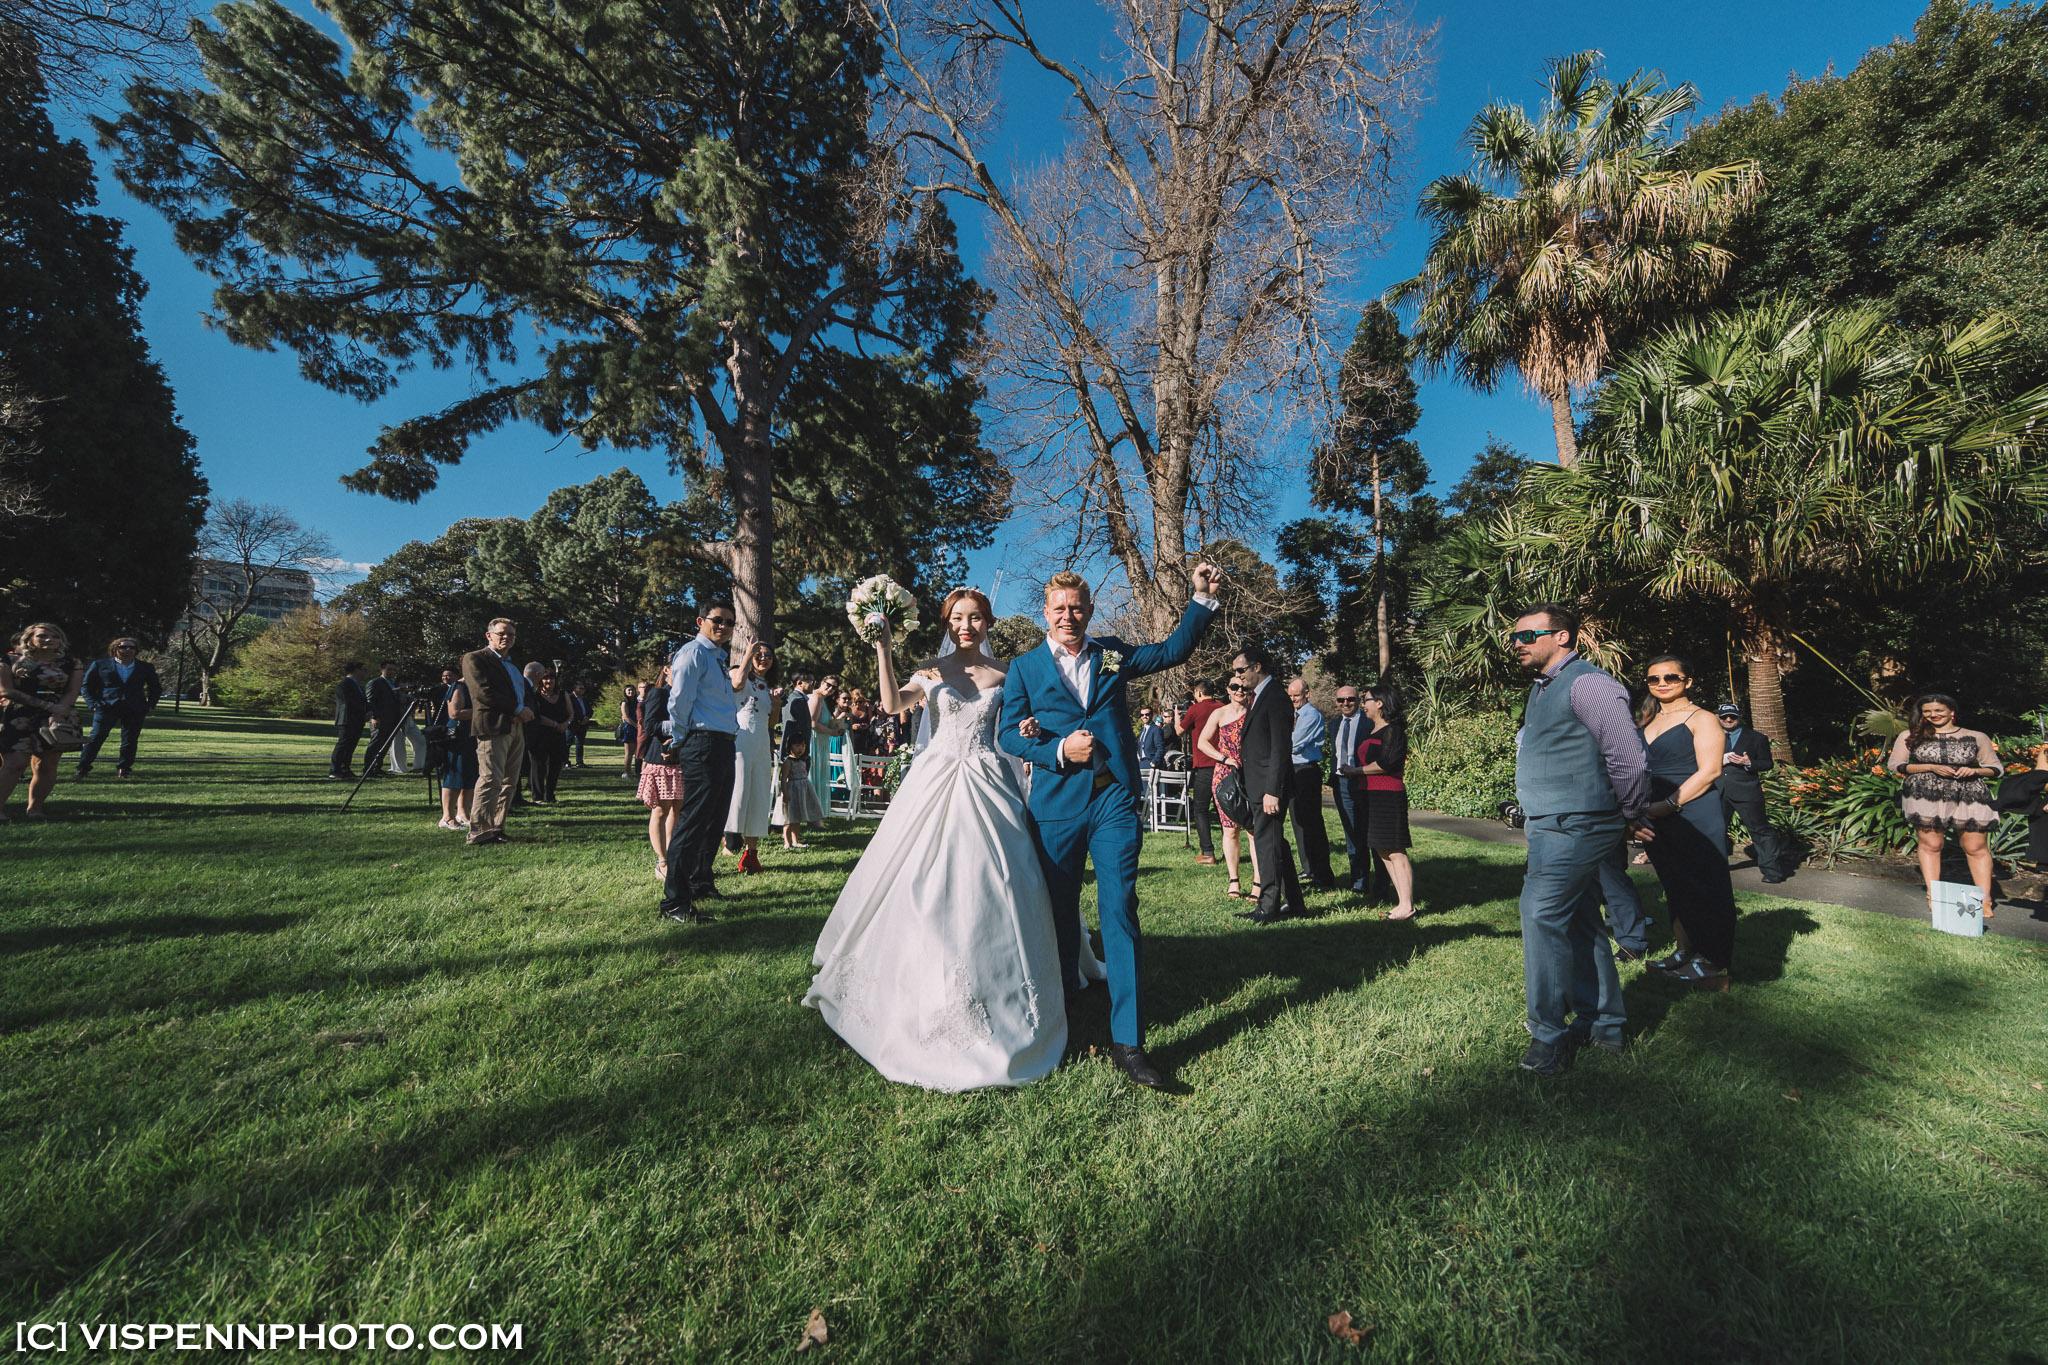 WEDDING DAY Photography Melbourne VISPENN 墨尔本 婚礼跟拍 婚礼摄像 婚礼摄影 结婚照 登记照 VISPENN 1P 1DX 01834